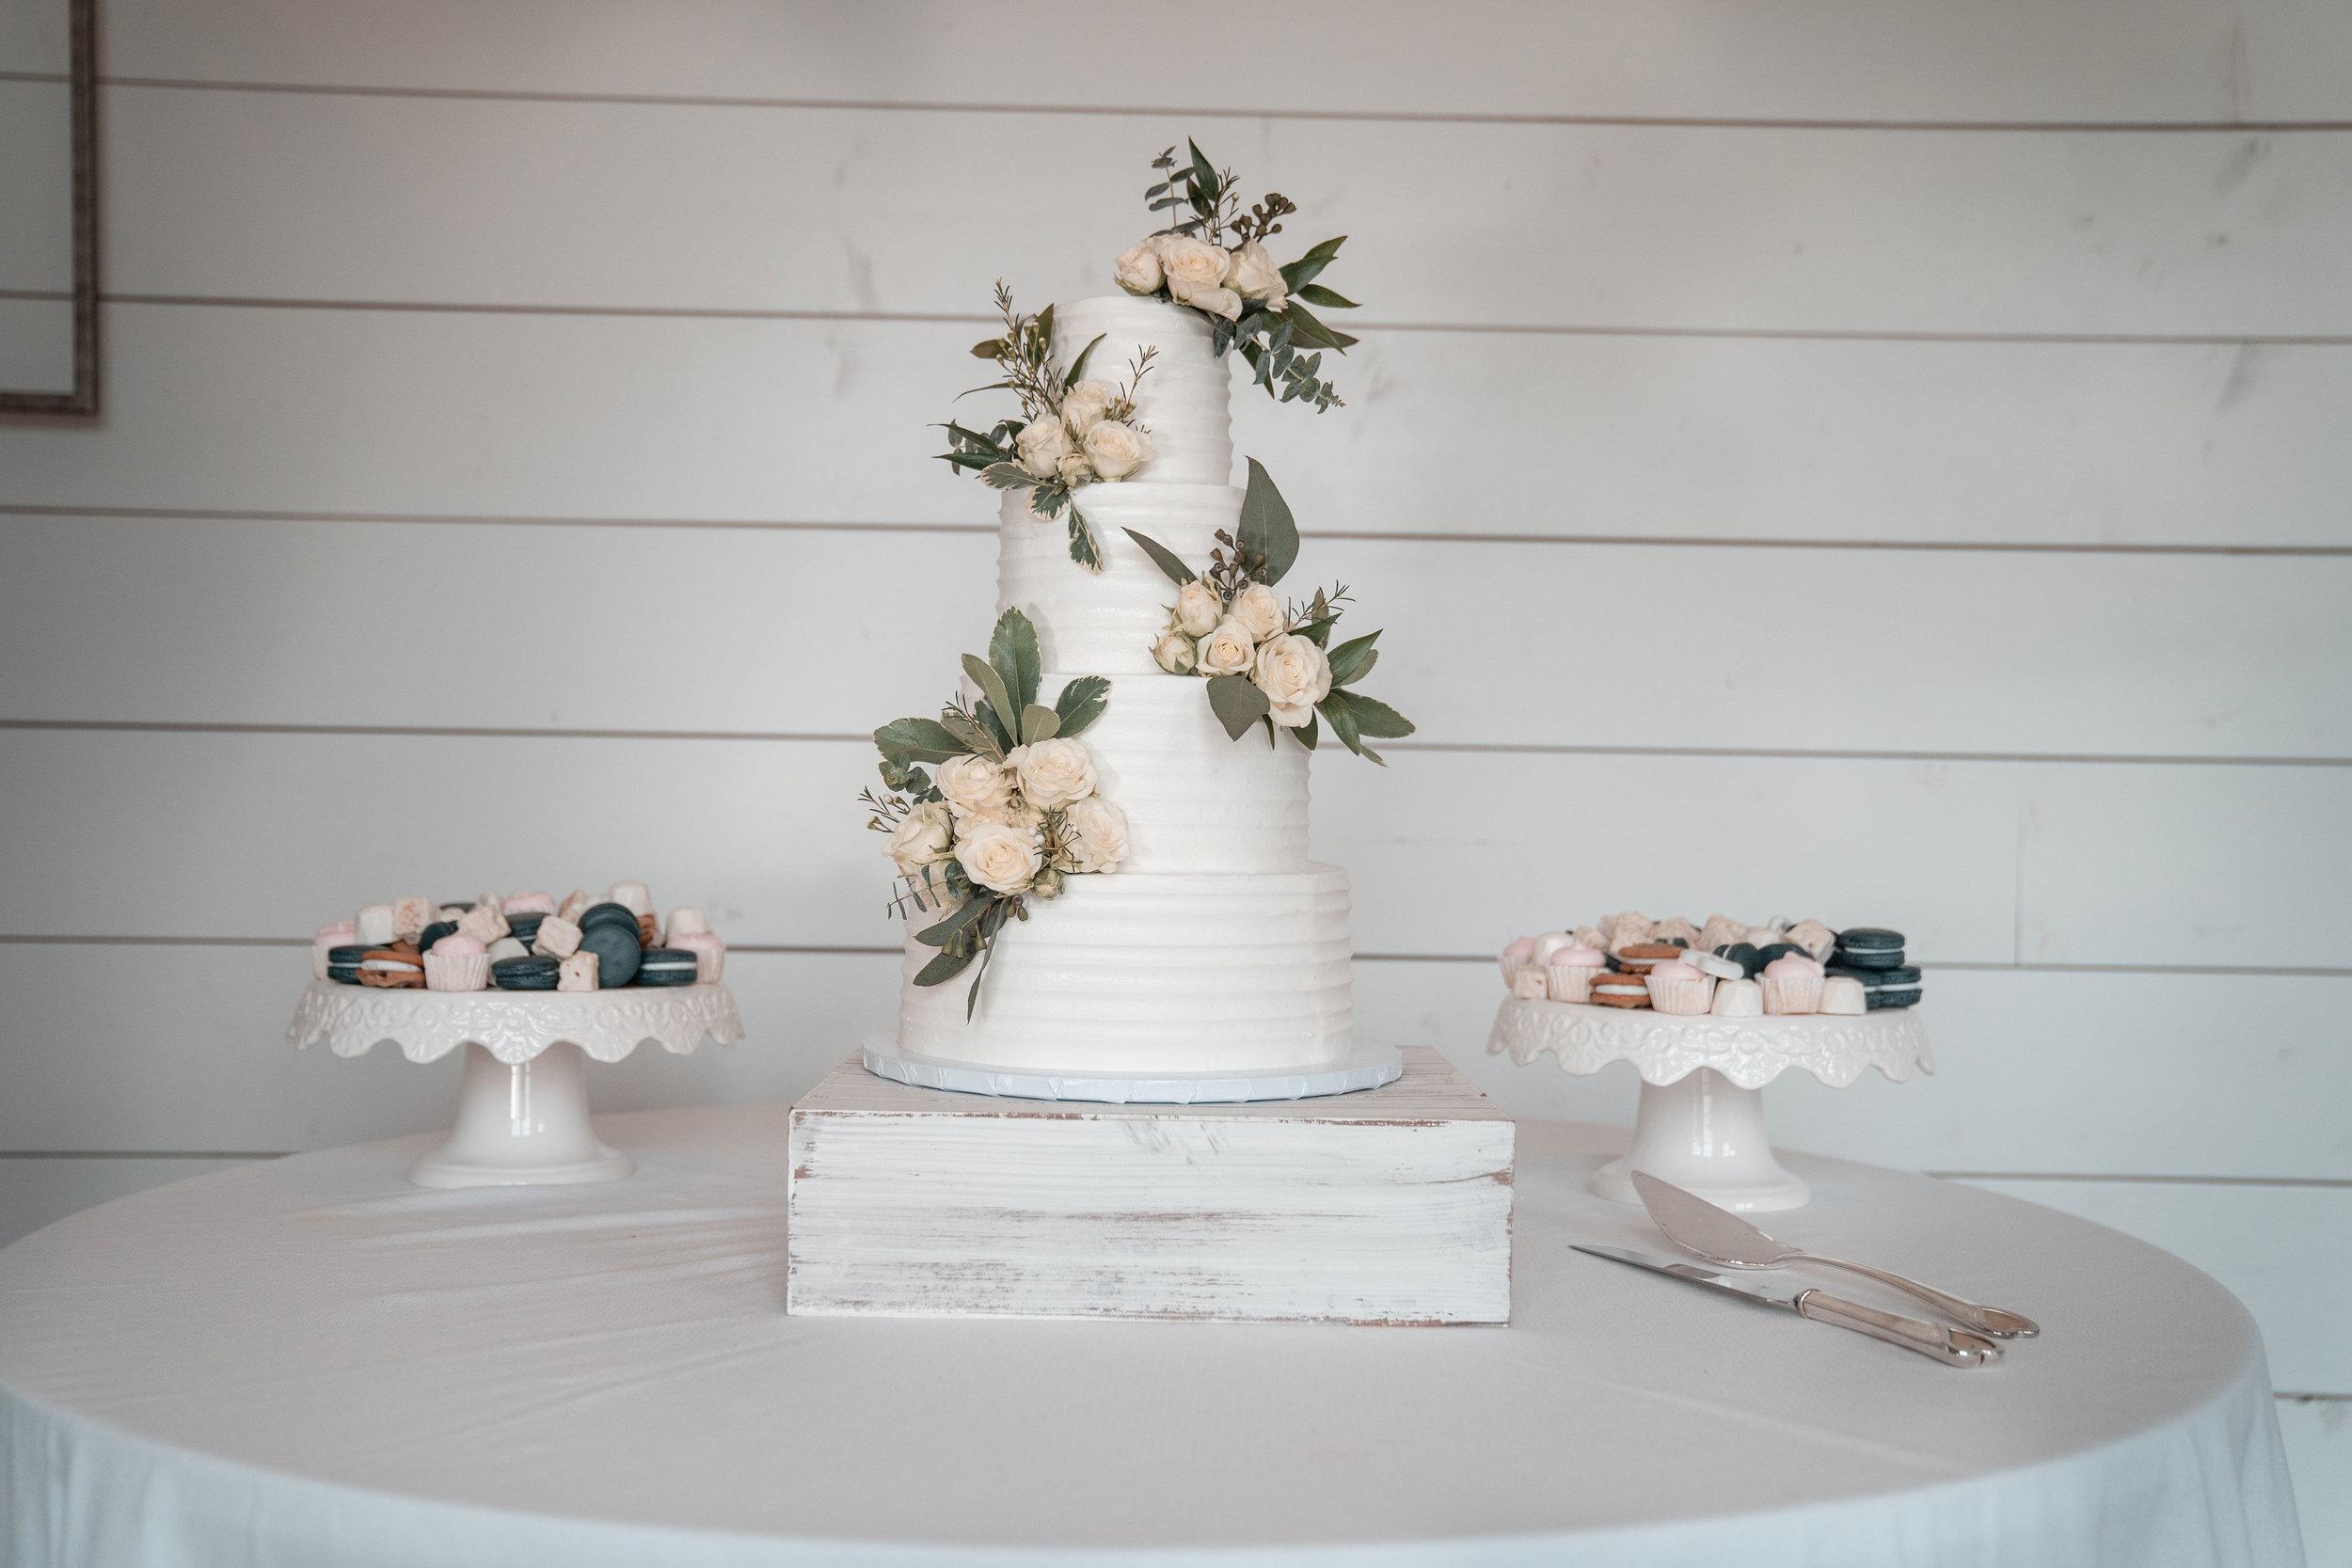 wedding cake infront of white shiplap wall.jpg